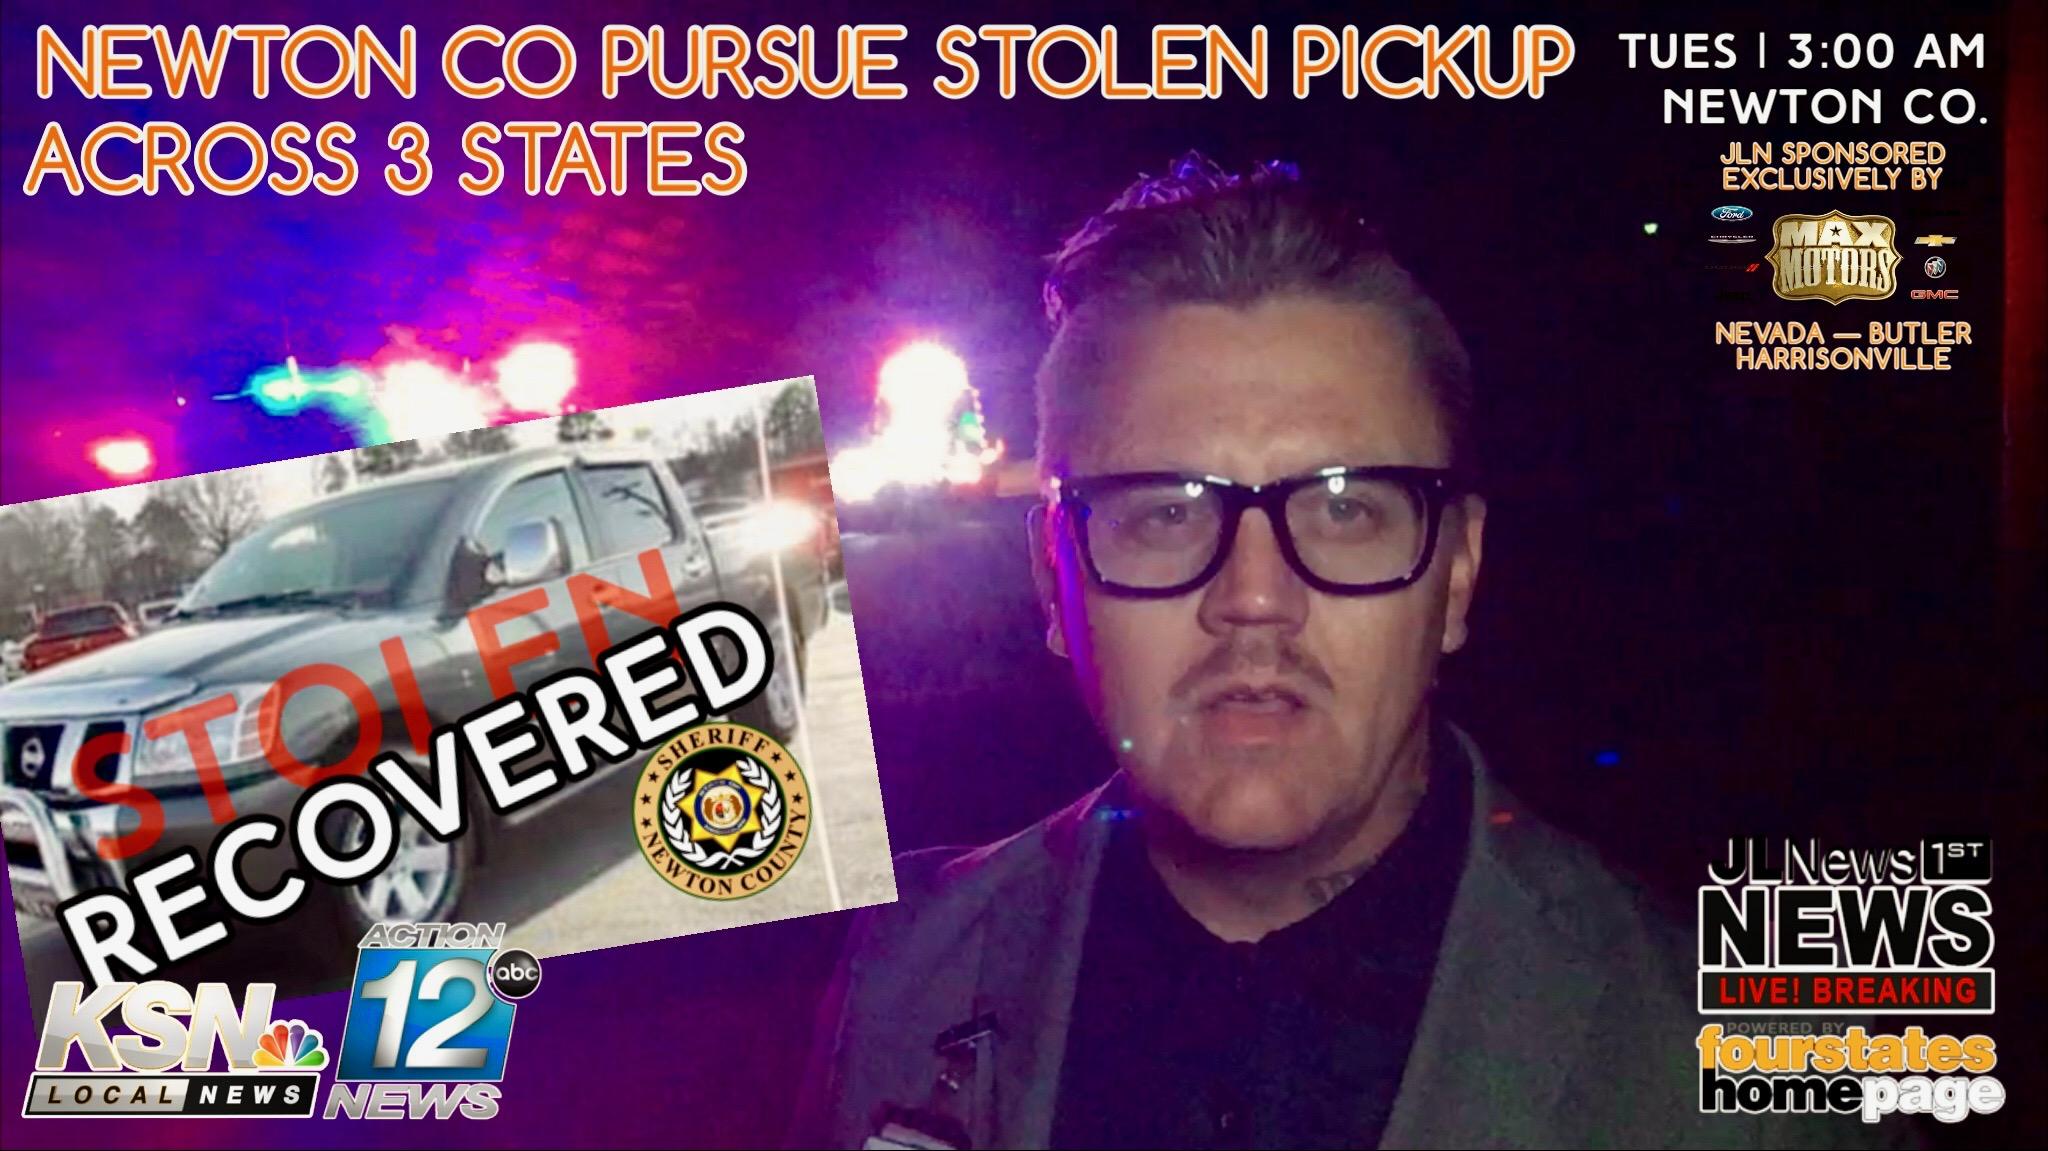 BREAKING: Police Pursue Stolen Pickup Overnight Across 3